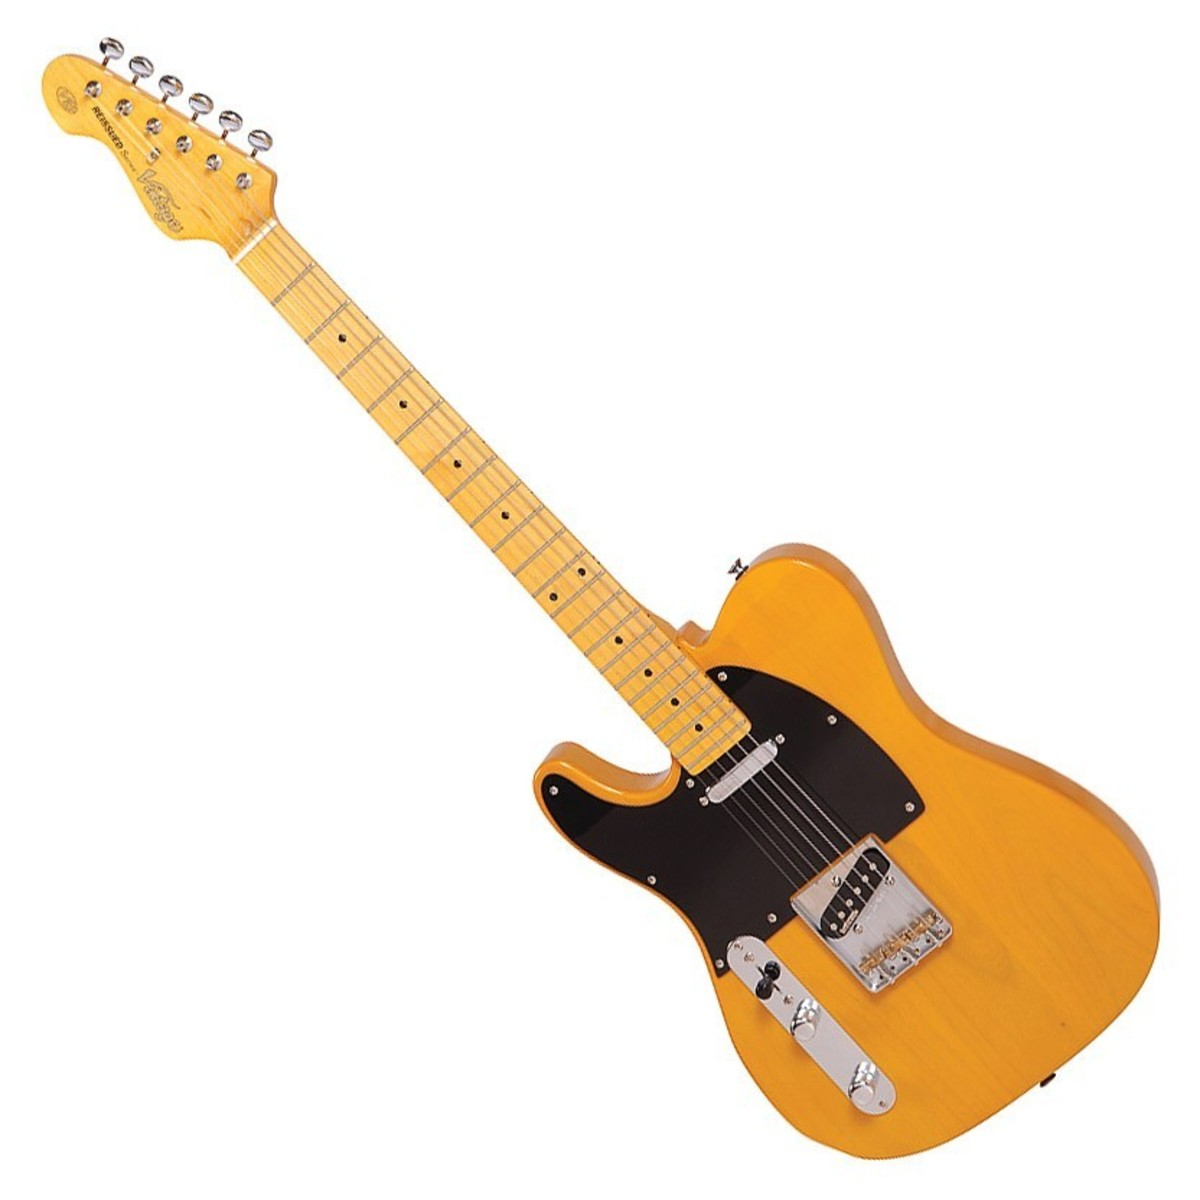 Image of Vintage Reissued V52 Left Handed Electric Guitar Butterscotch - B-Stock